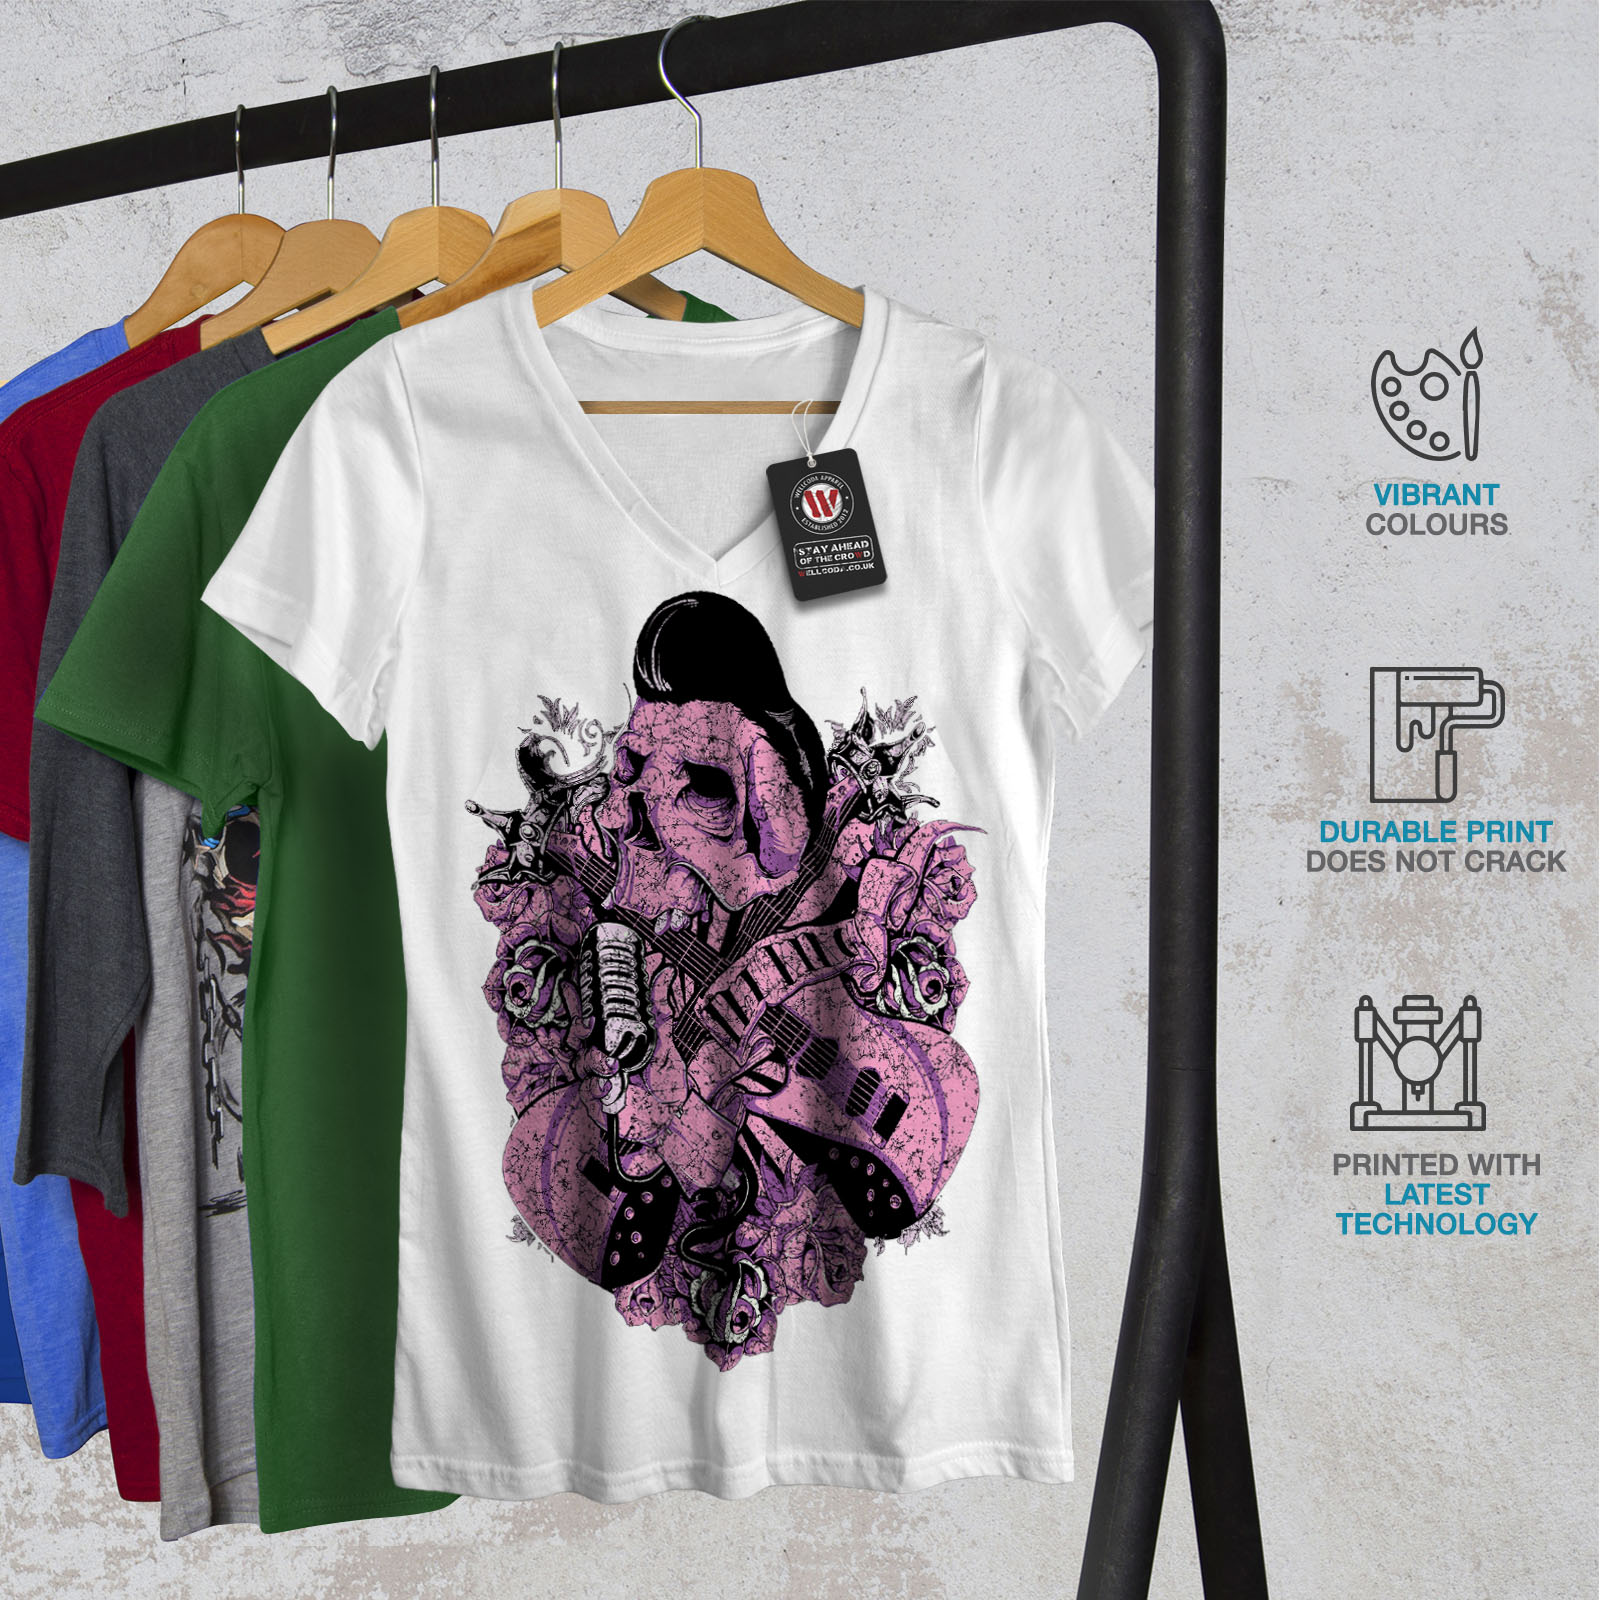 Rock n roll skull musique Femmes Femmes Femmes T-Shirt col V nouveau dd559f